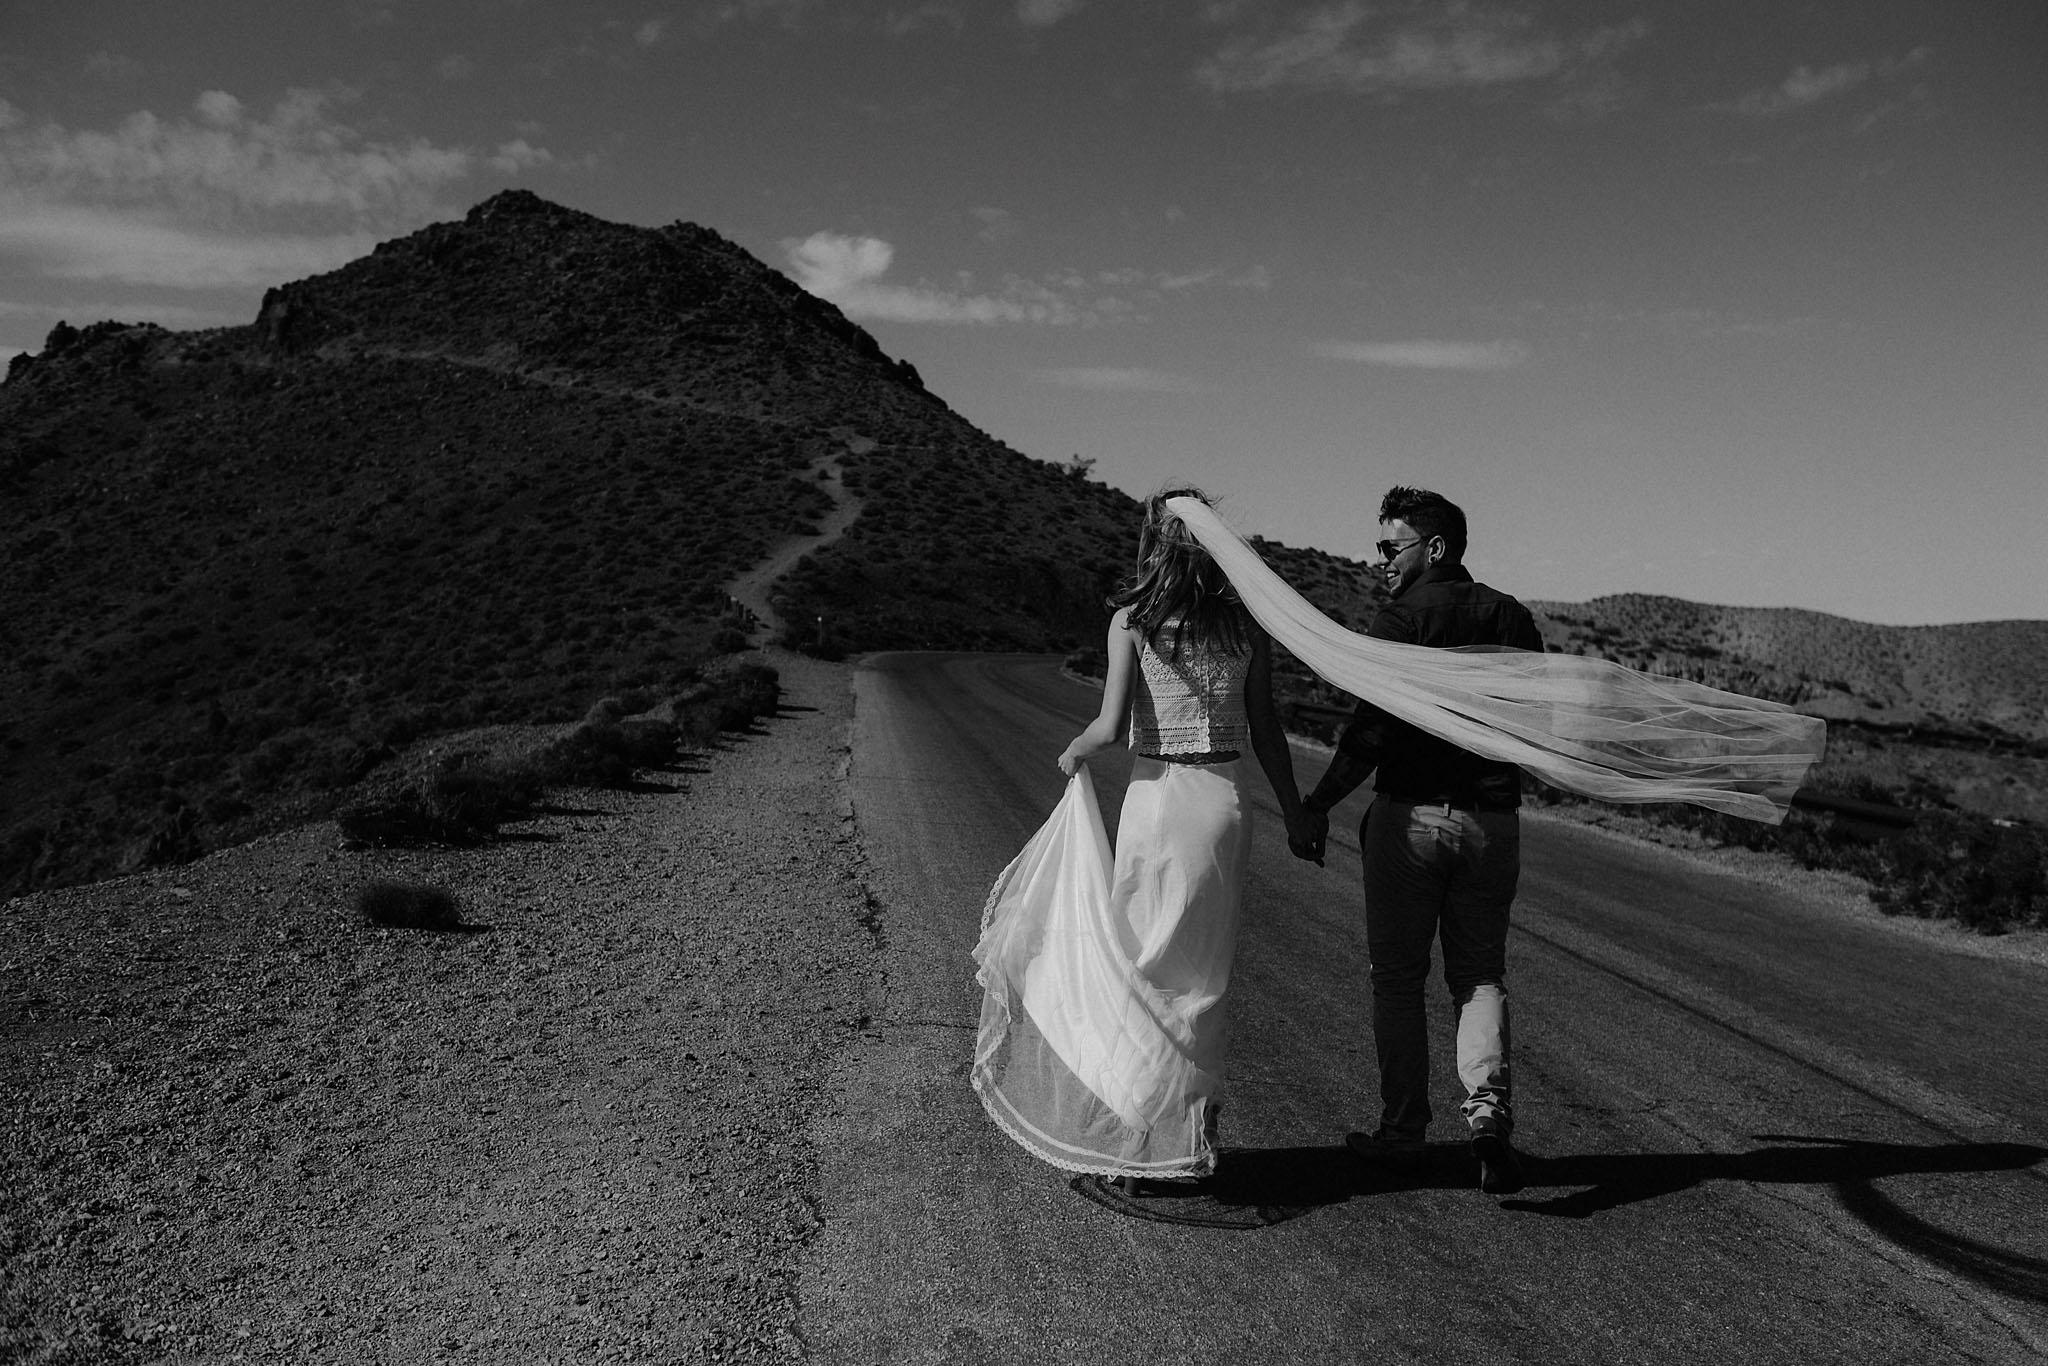 death valley adventure elopement wedding photographer national park couple walking portrait